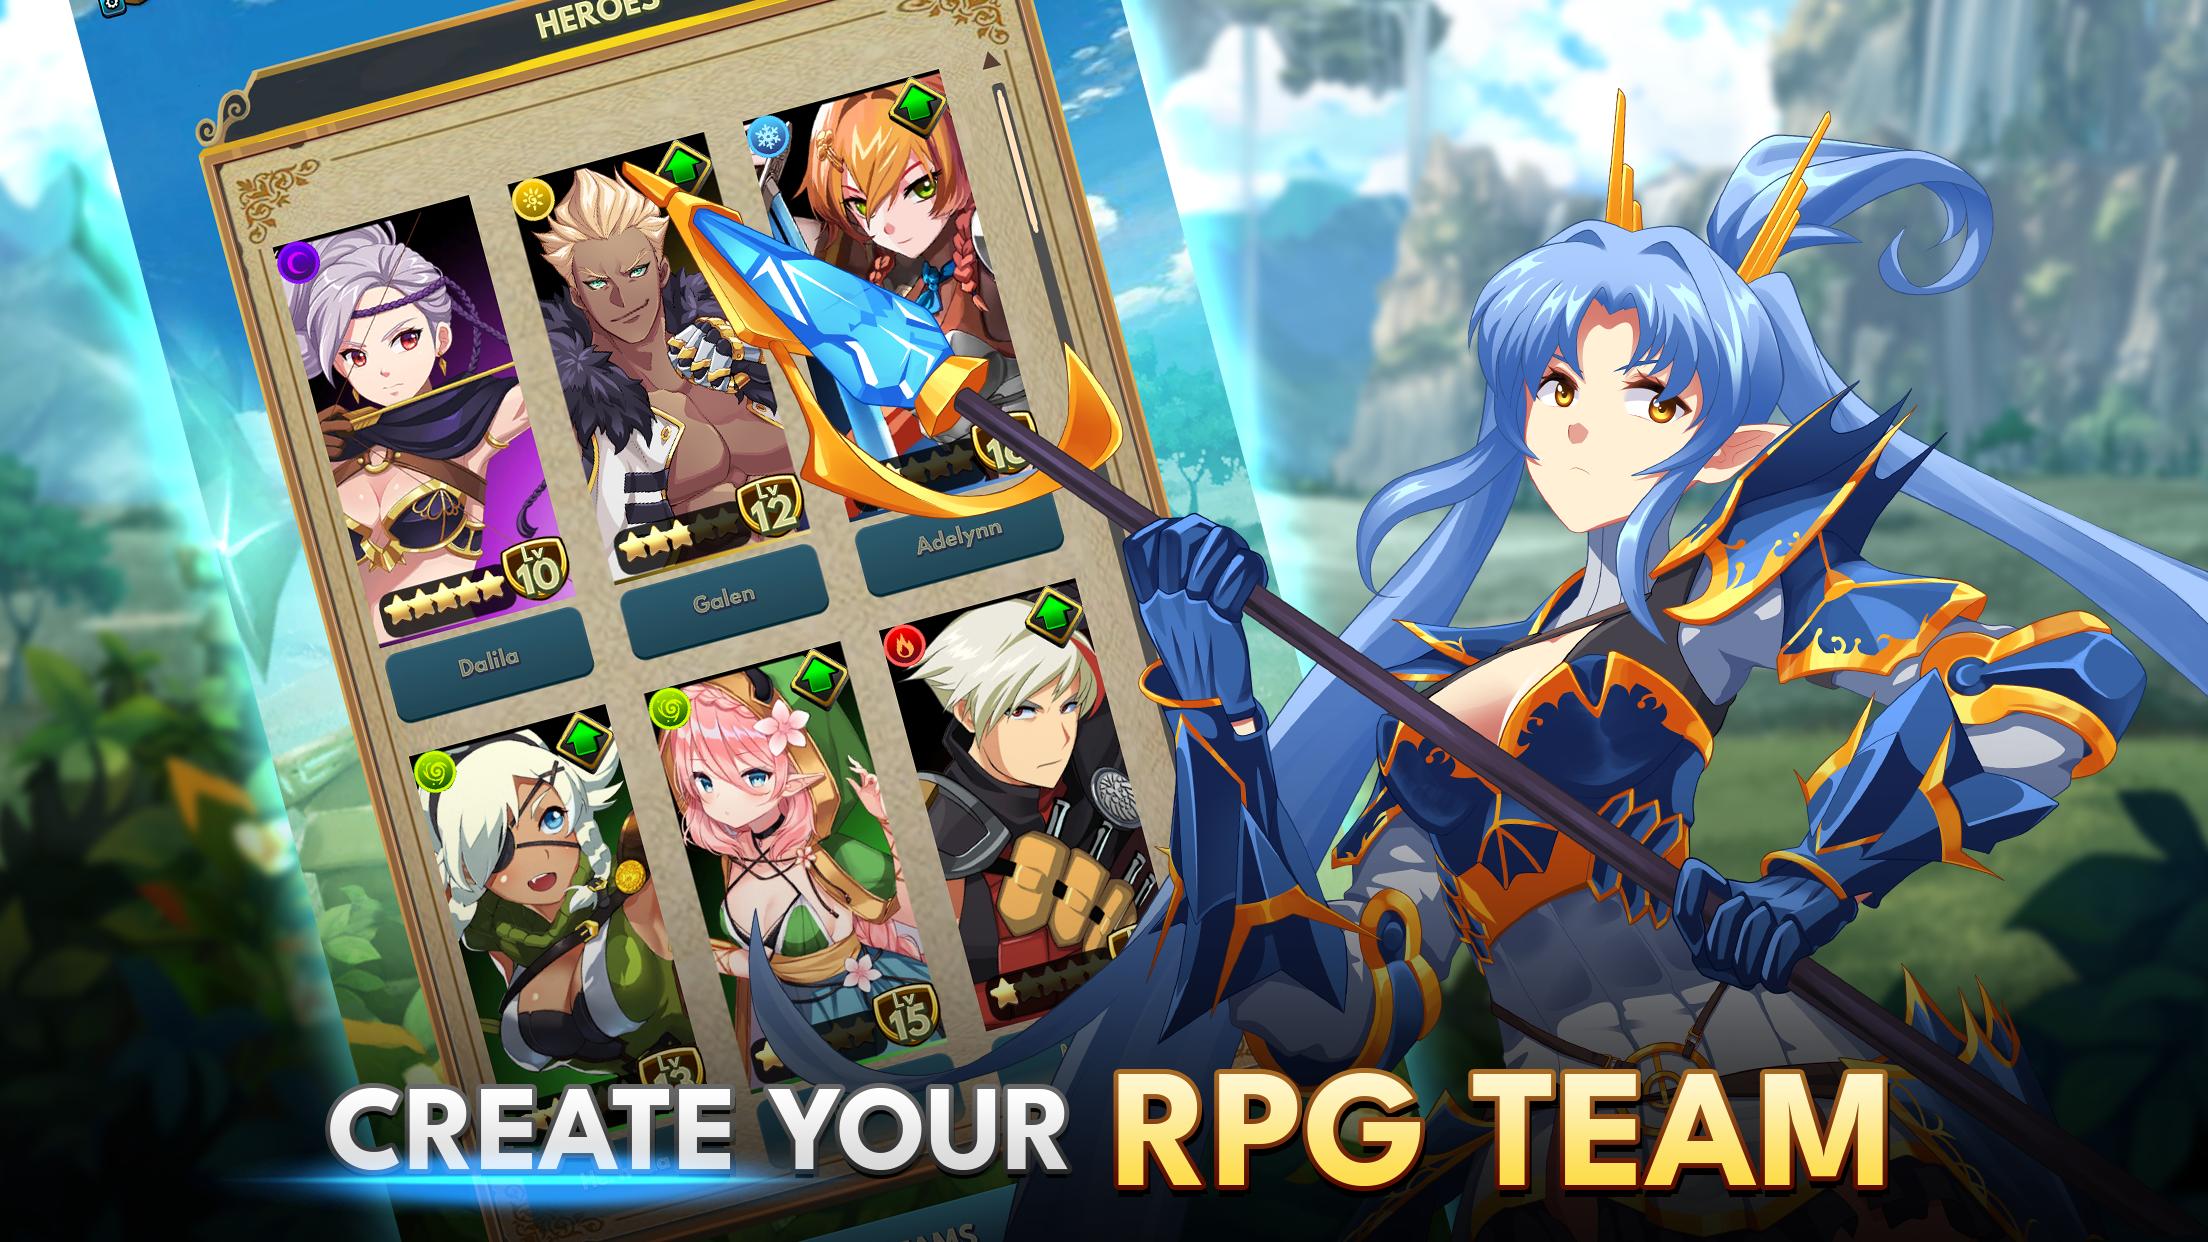 Create Your RPG Team